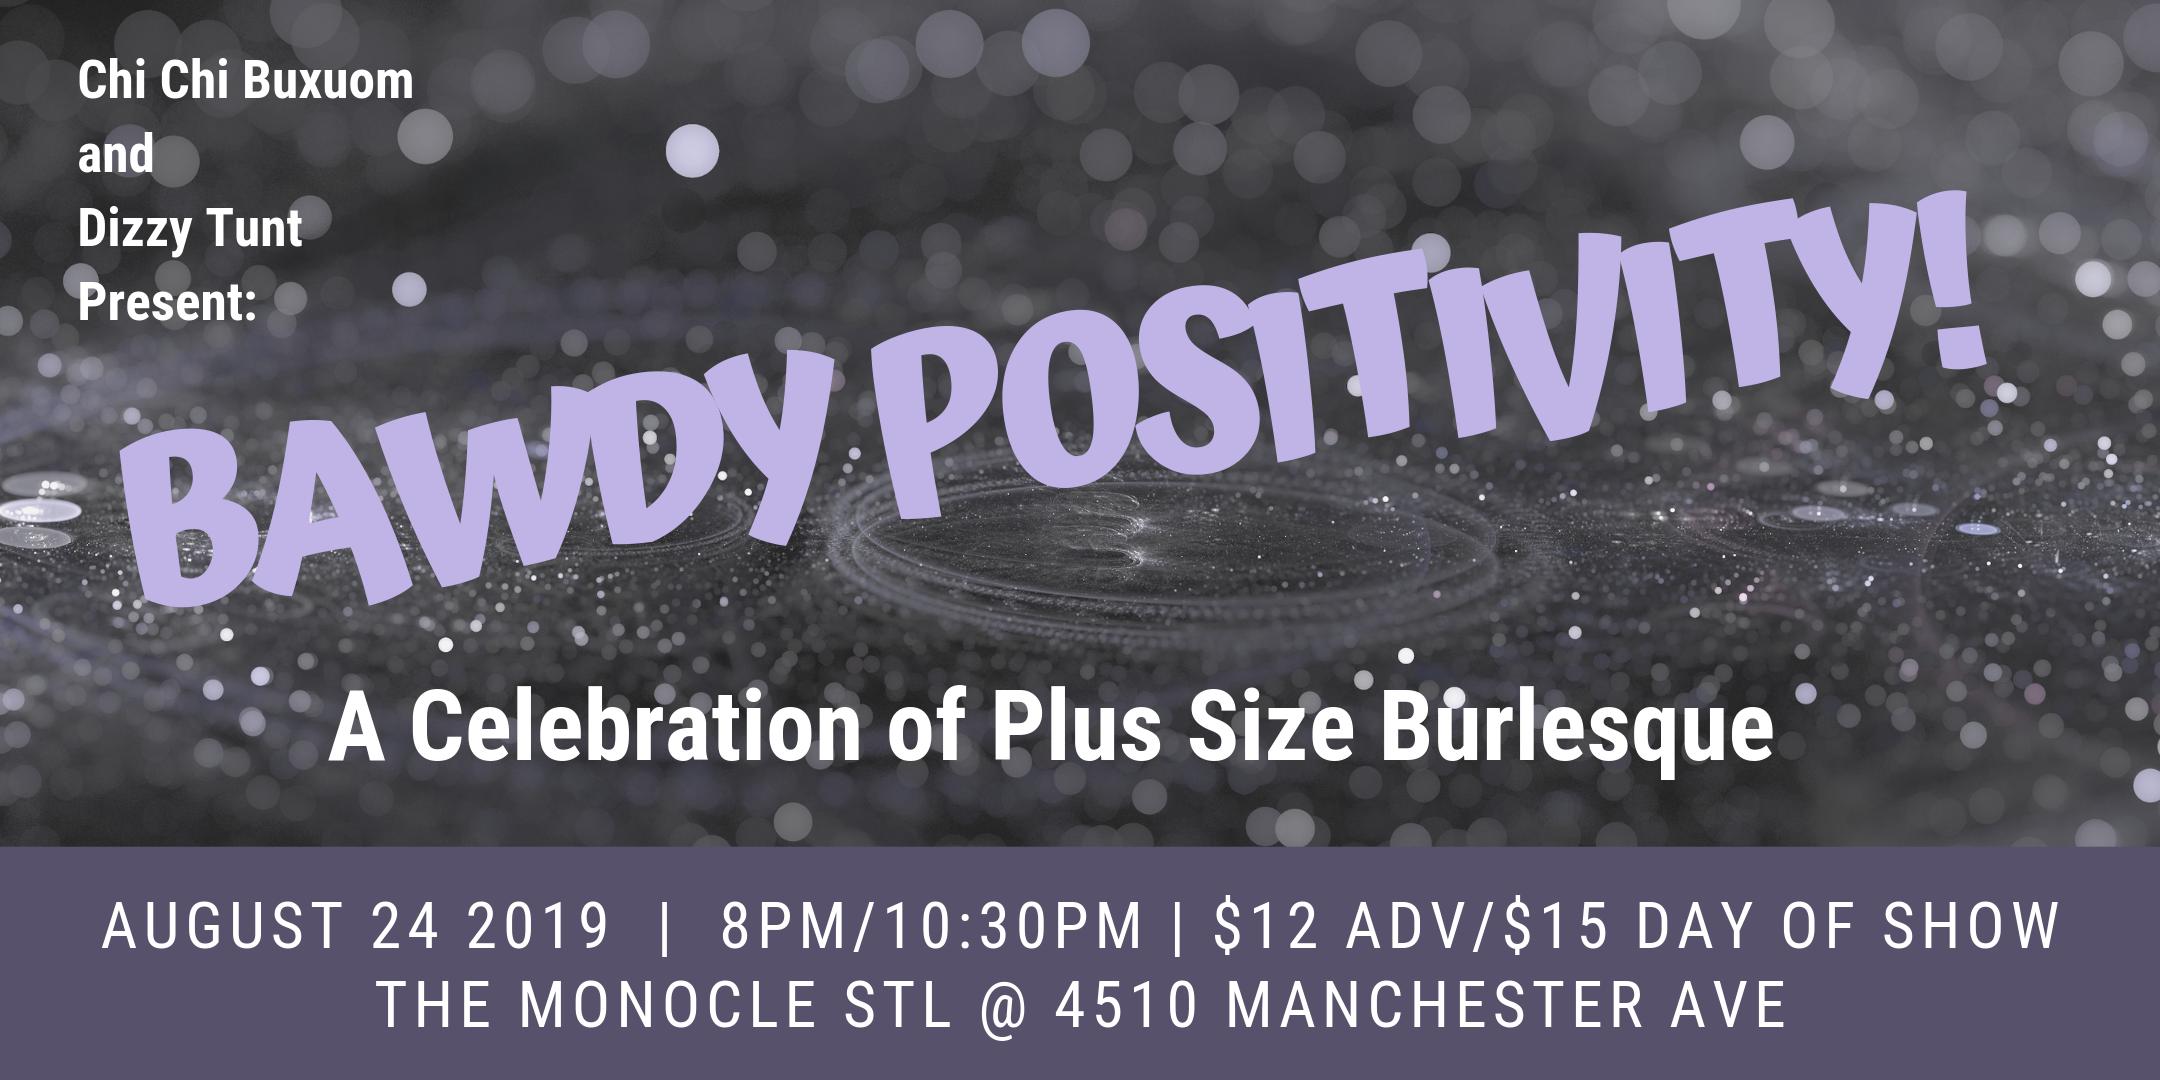 Bawdy Positivity Eventbrite.png